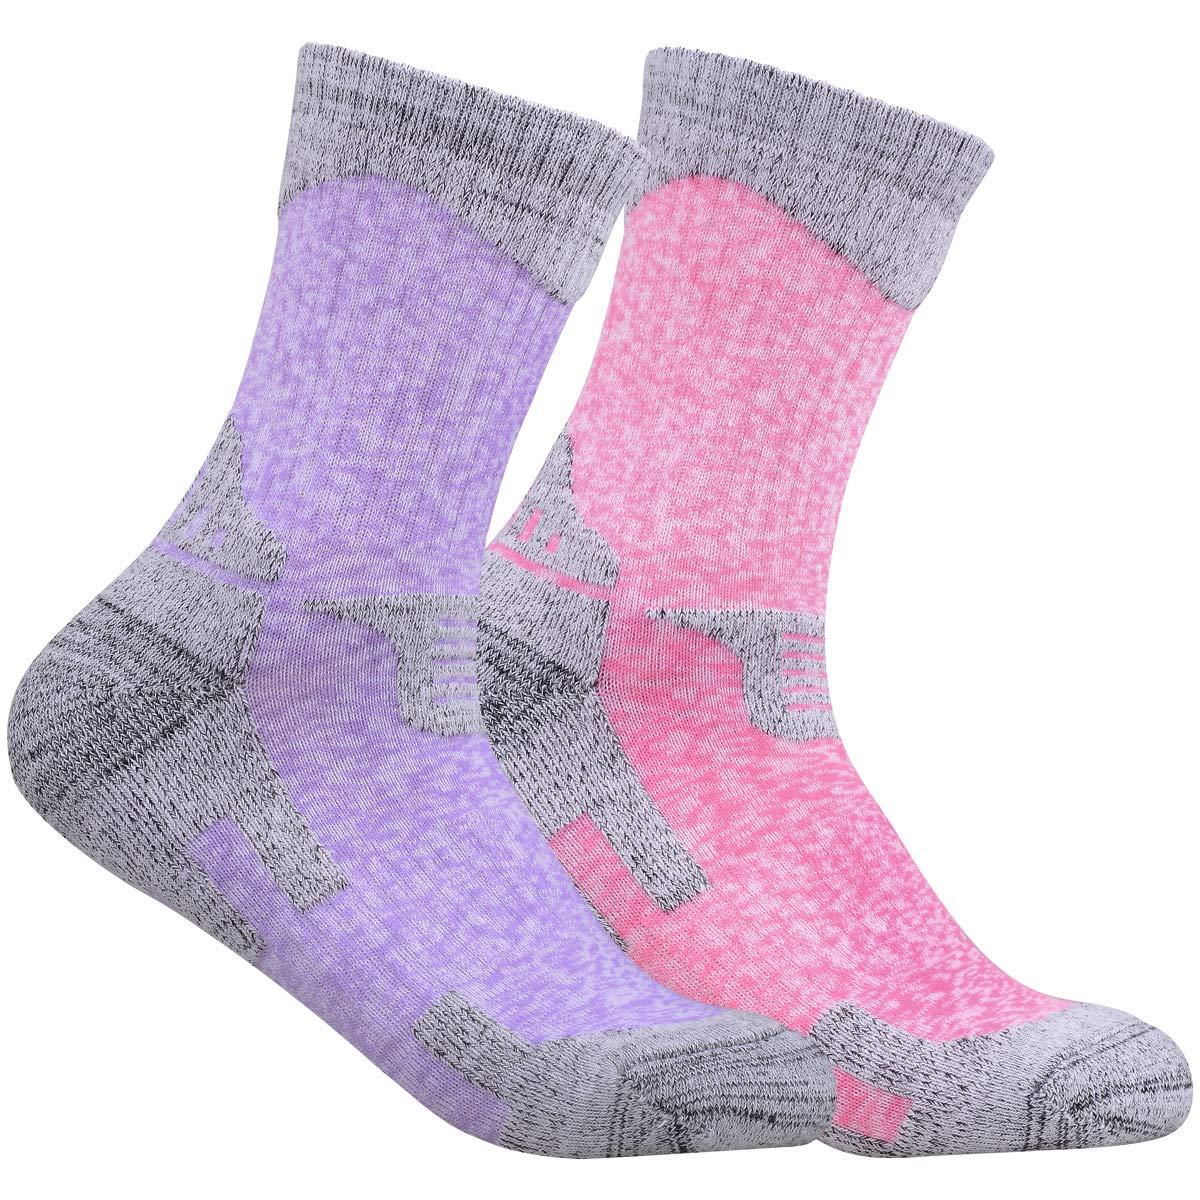 YUEDGE Women's 2 Pack Multi Performance Outdoor Sports Hiking Trekking Running Cushion Cotton Crew Socks(Assortment Purple Red)